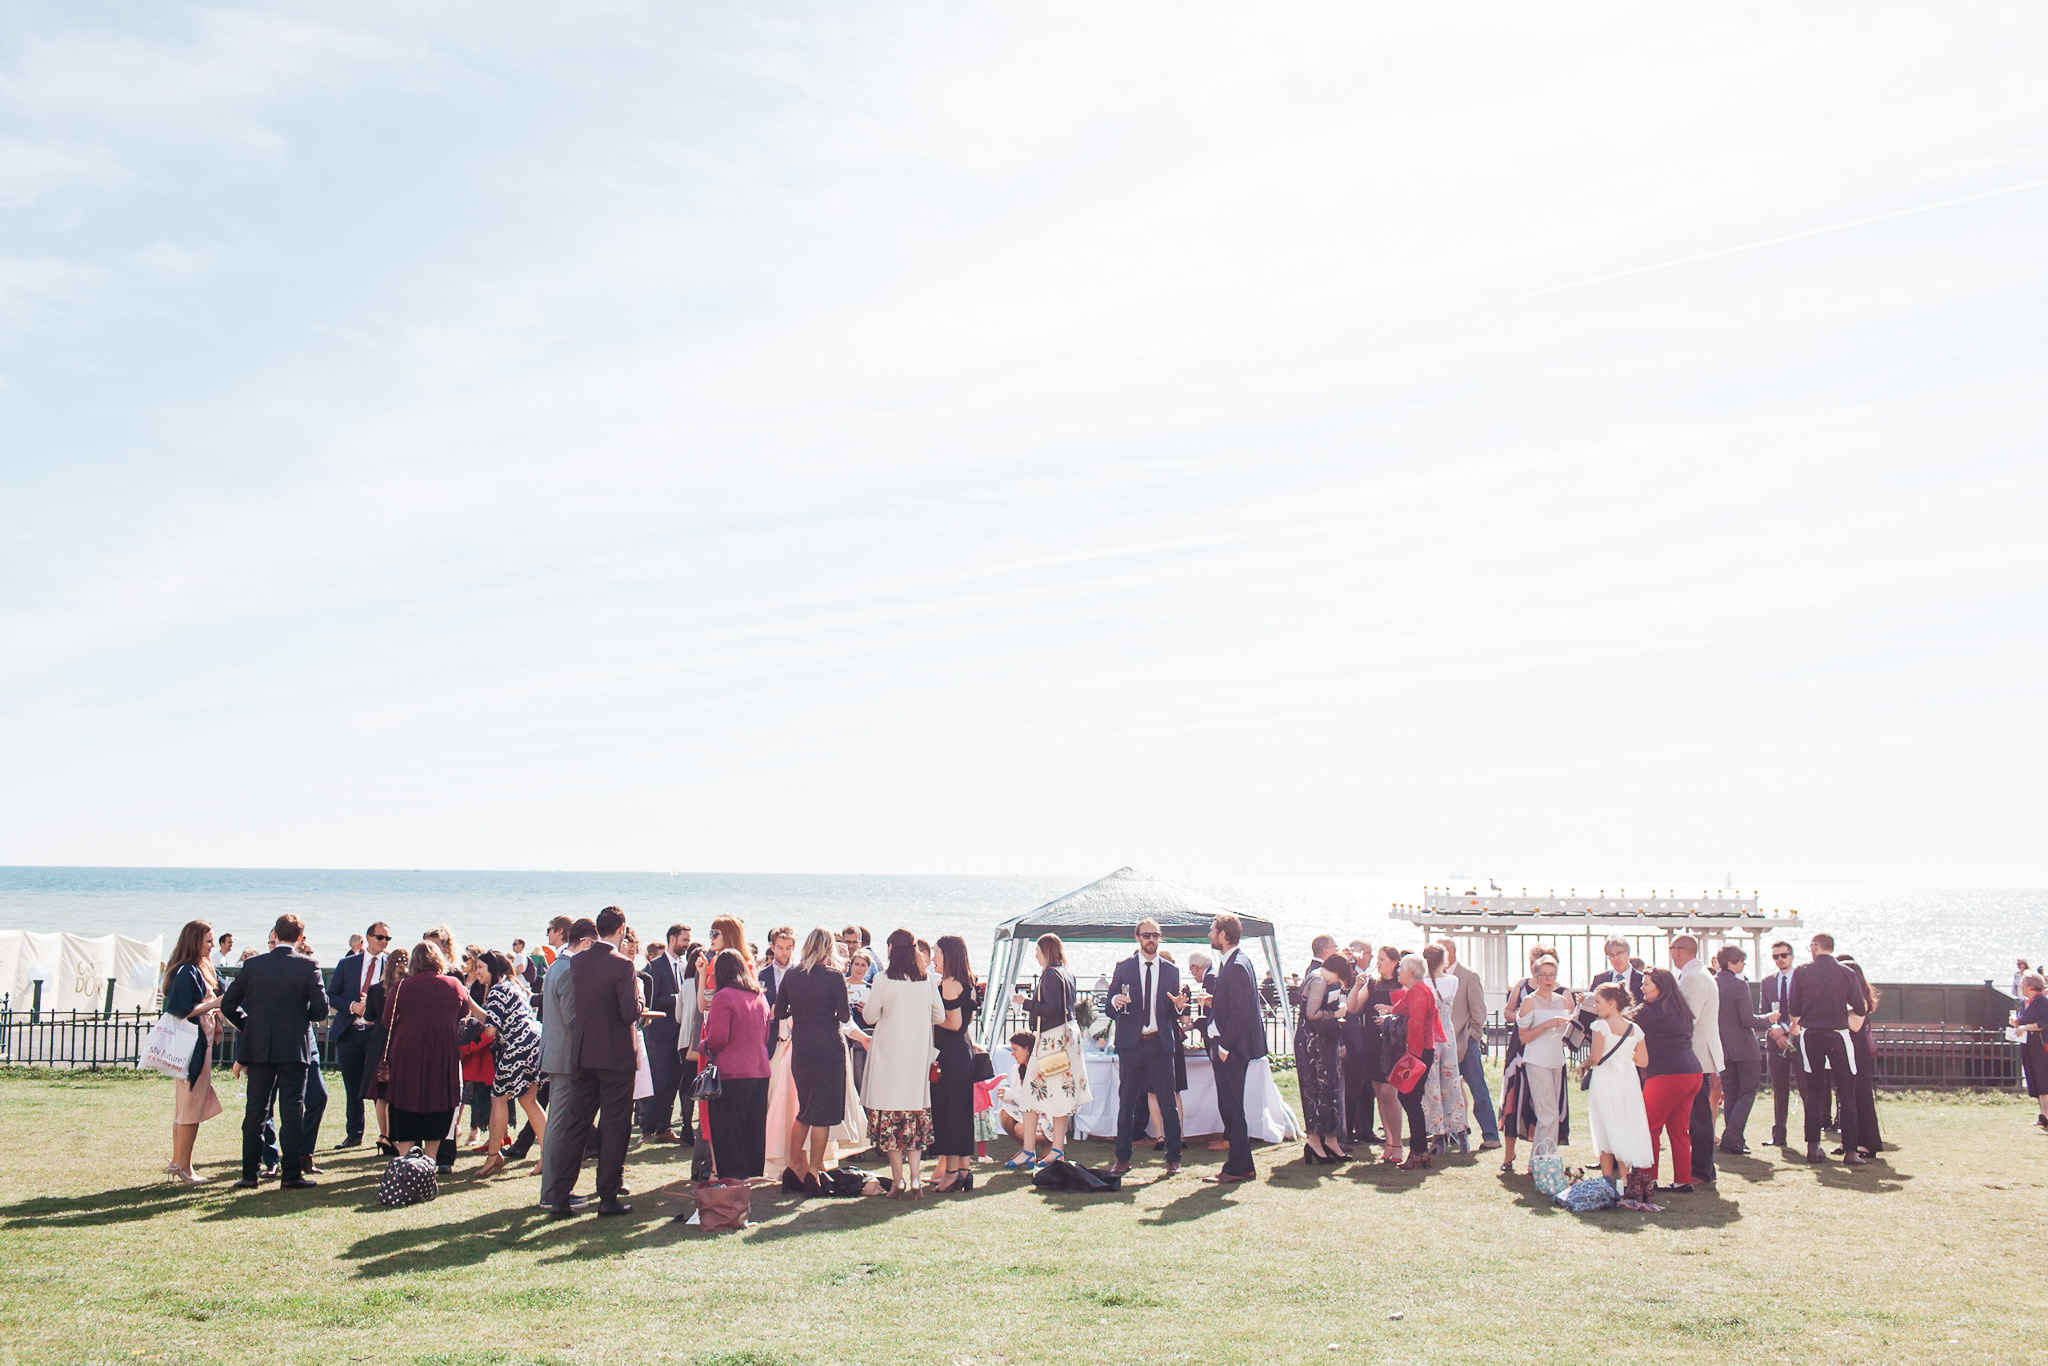 st_andrews_fabrica_brighton_wedding_575.jpg